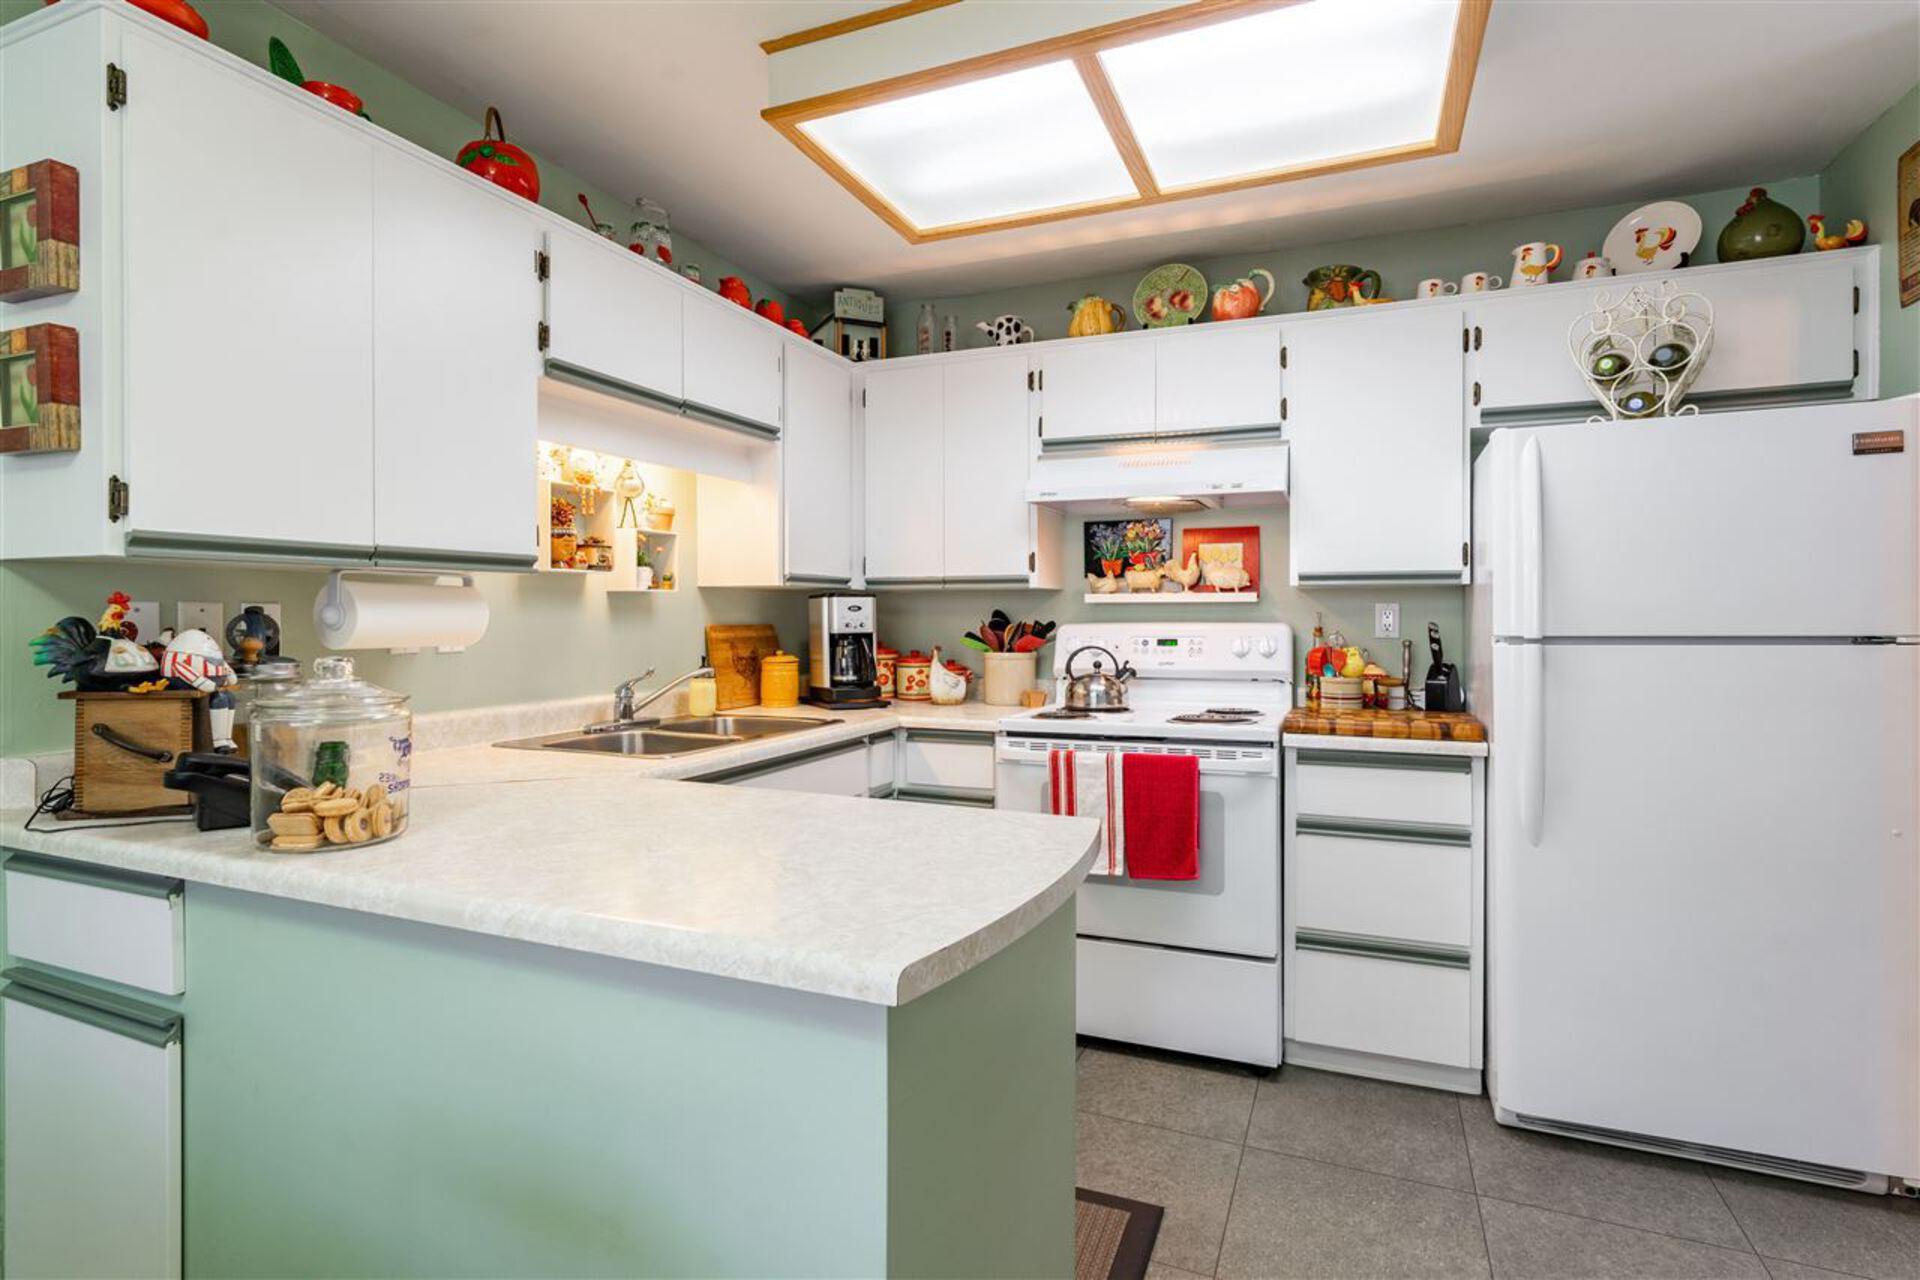 1318-brunette-avenue-maillardville-coquitlam-12 of 1 - 1318 Brunette Avenue, Maillardville, Coquitlam